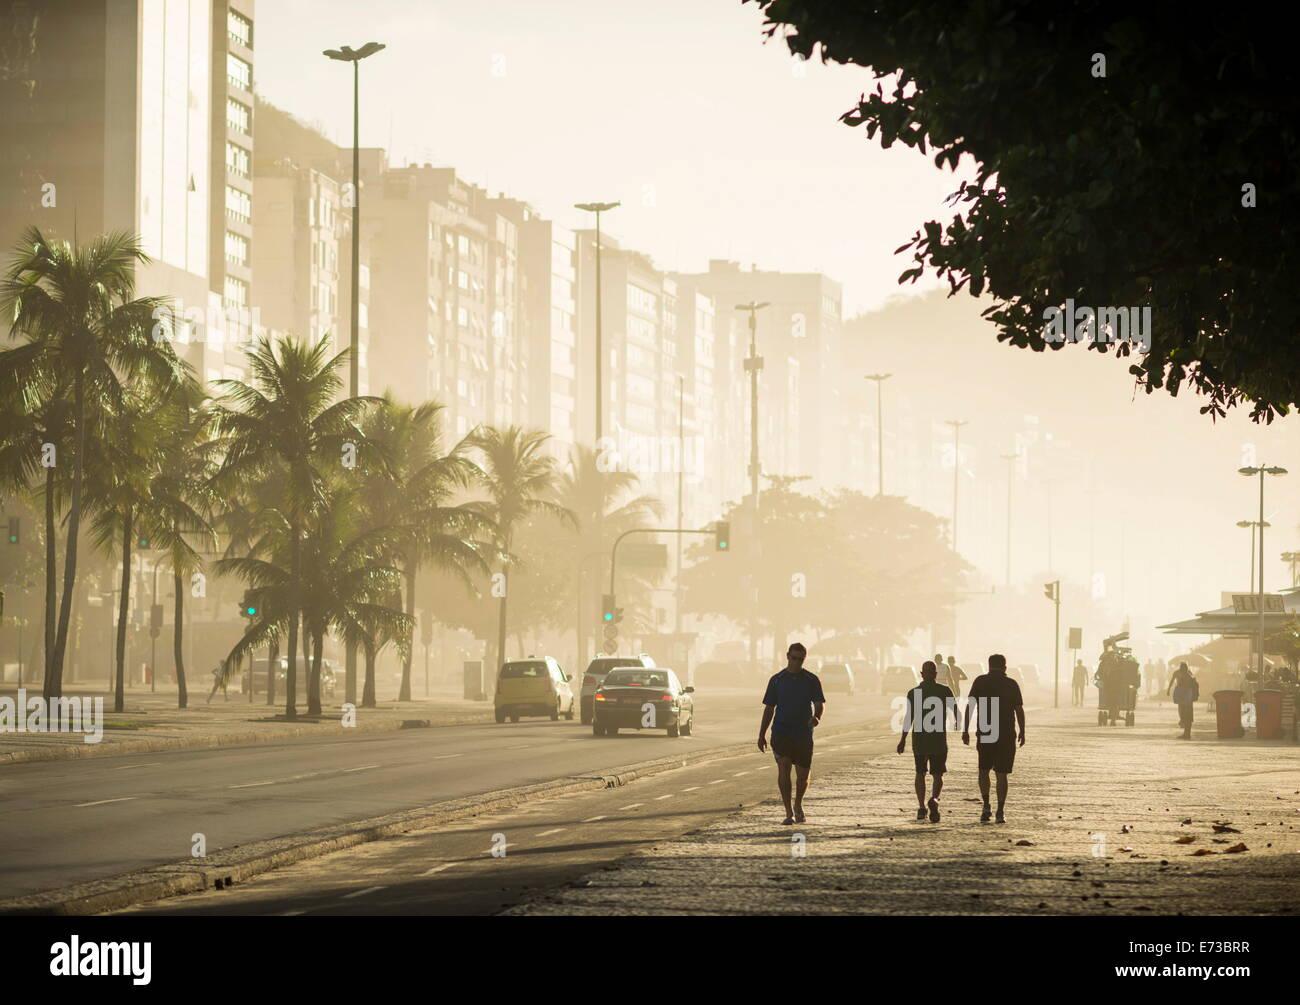 Copacabana Beach at dawn, Rio de Janeiro, Brazil, South America - Stock Image